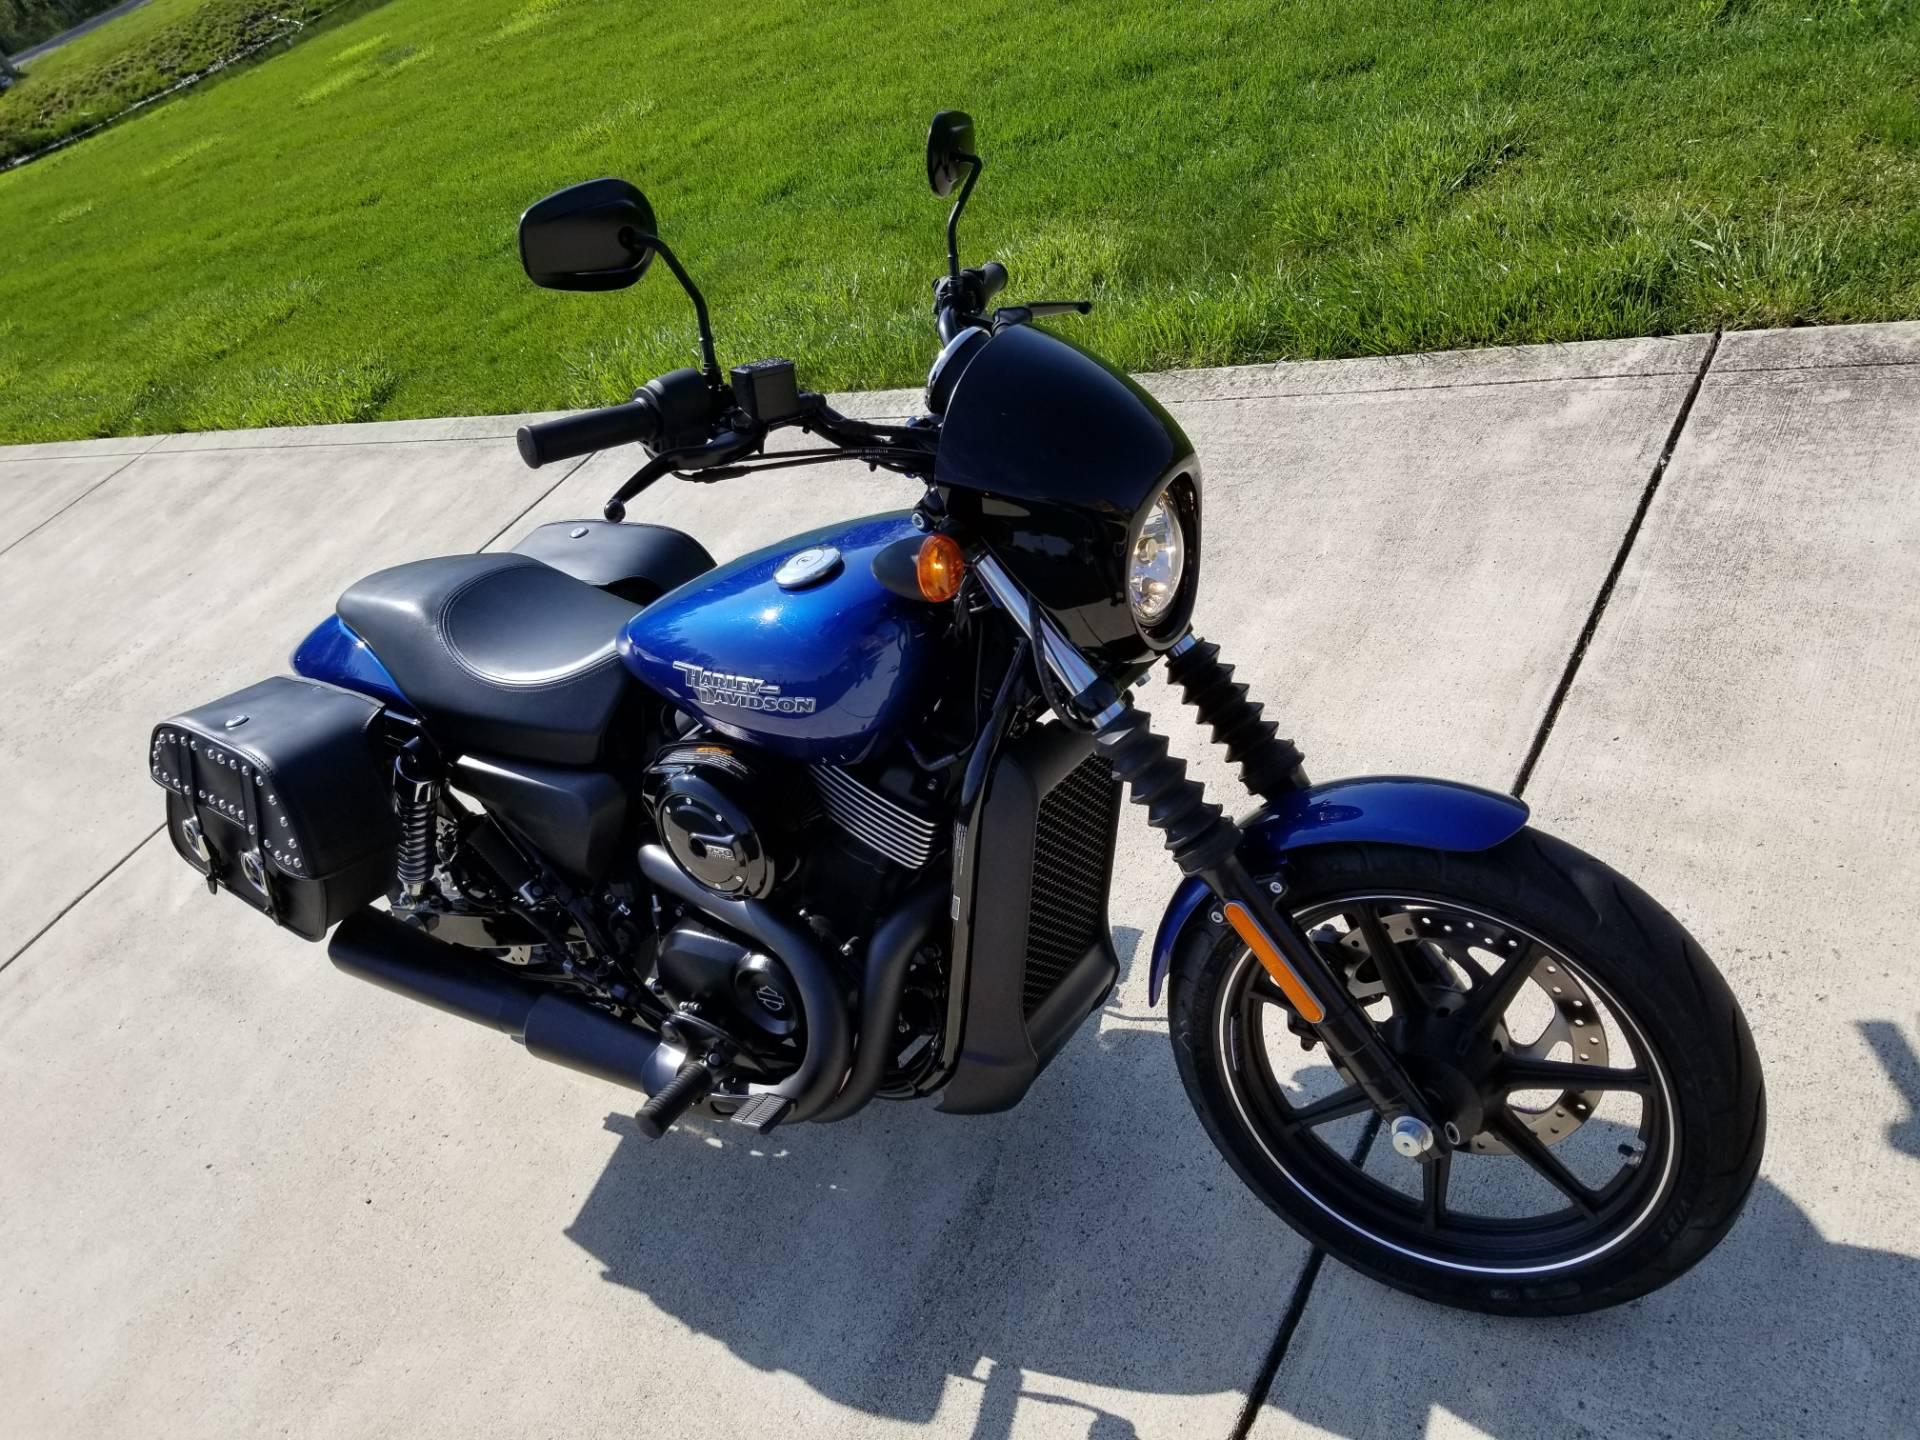 2017 Harley Davidson Street 750 In Sunbury Ohio